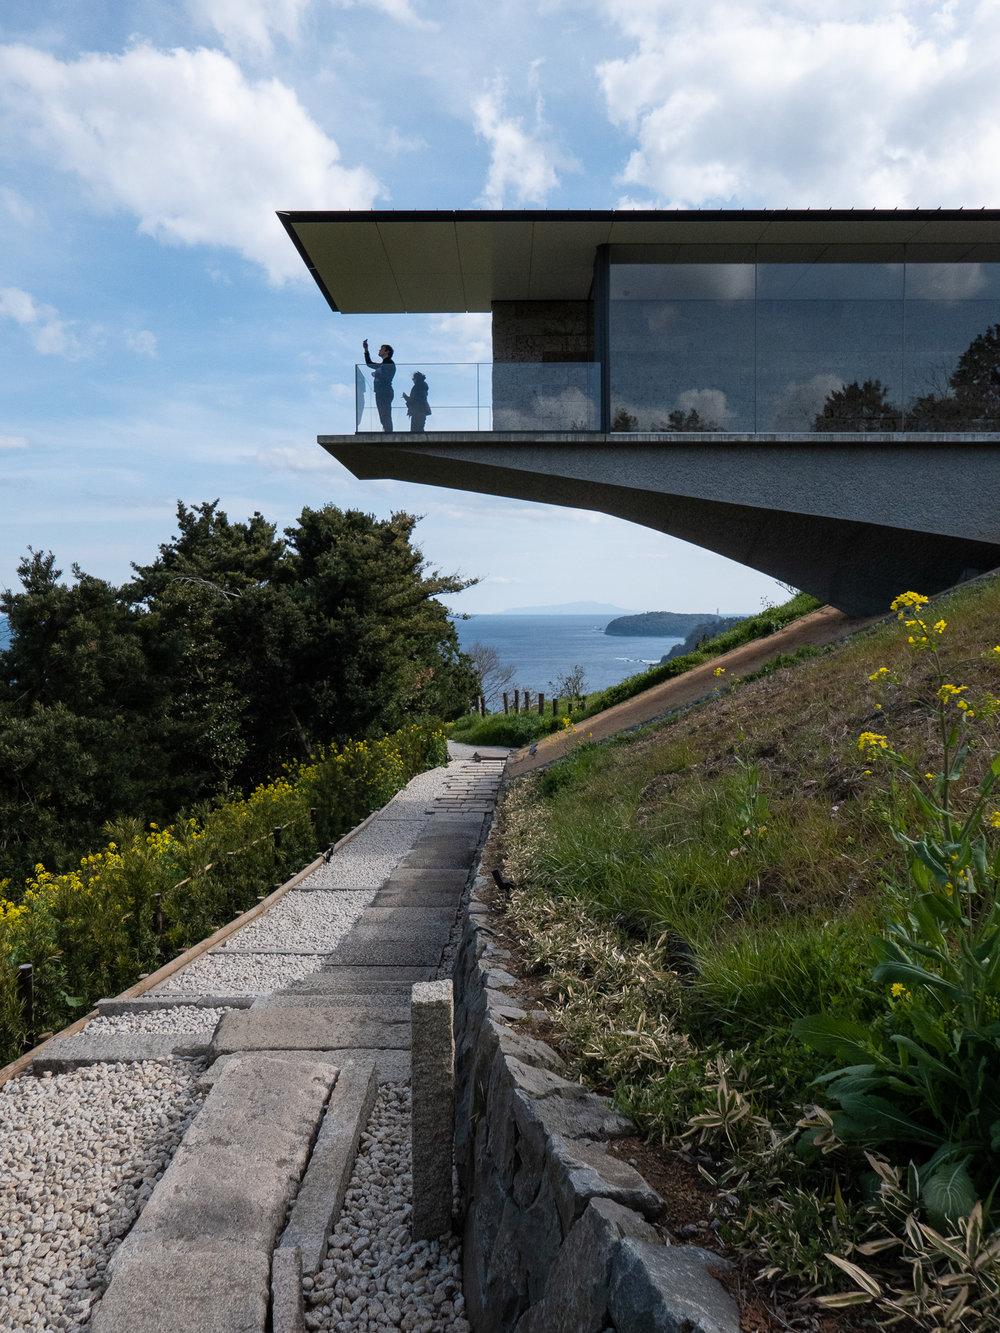 - Hiroshi Sugimoto making waves in architecture